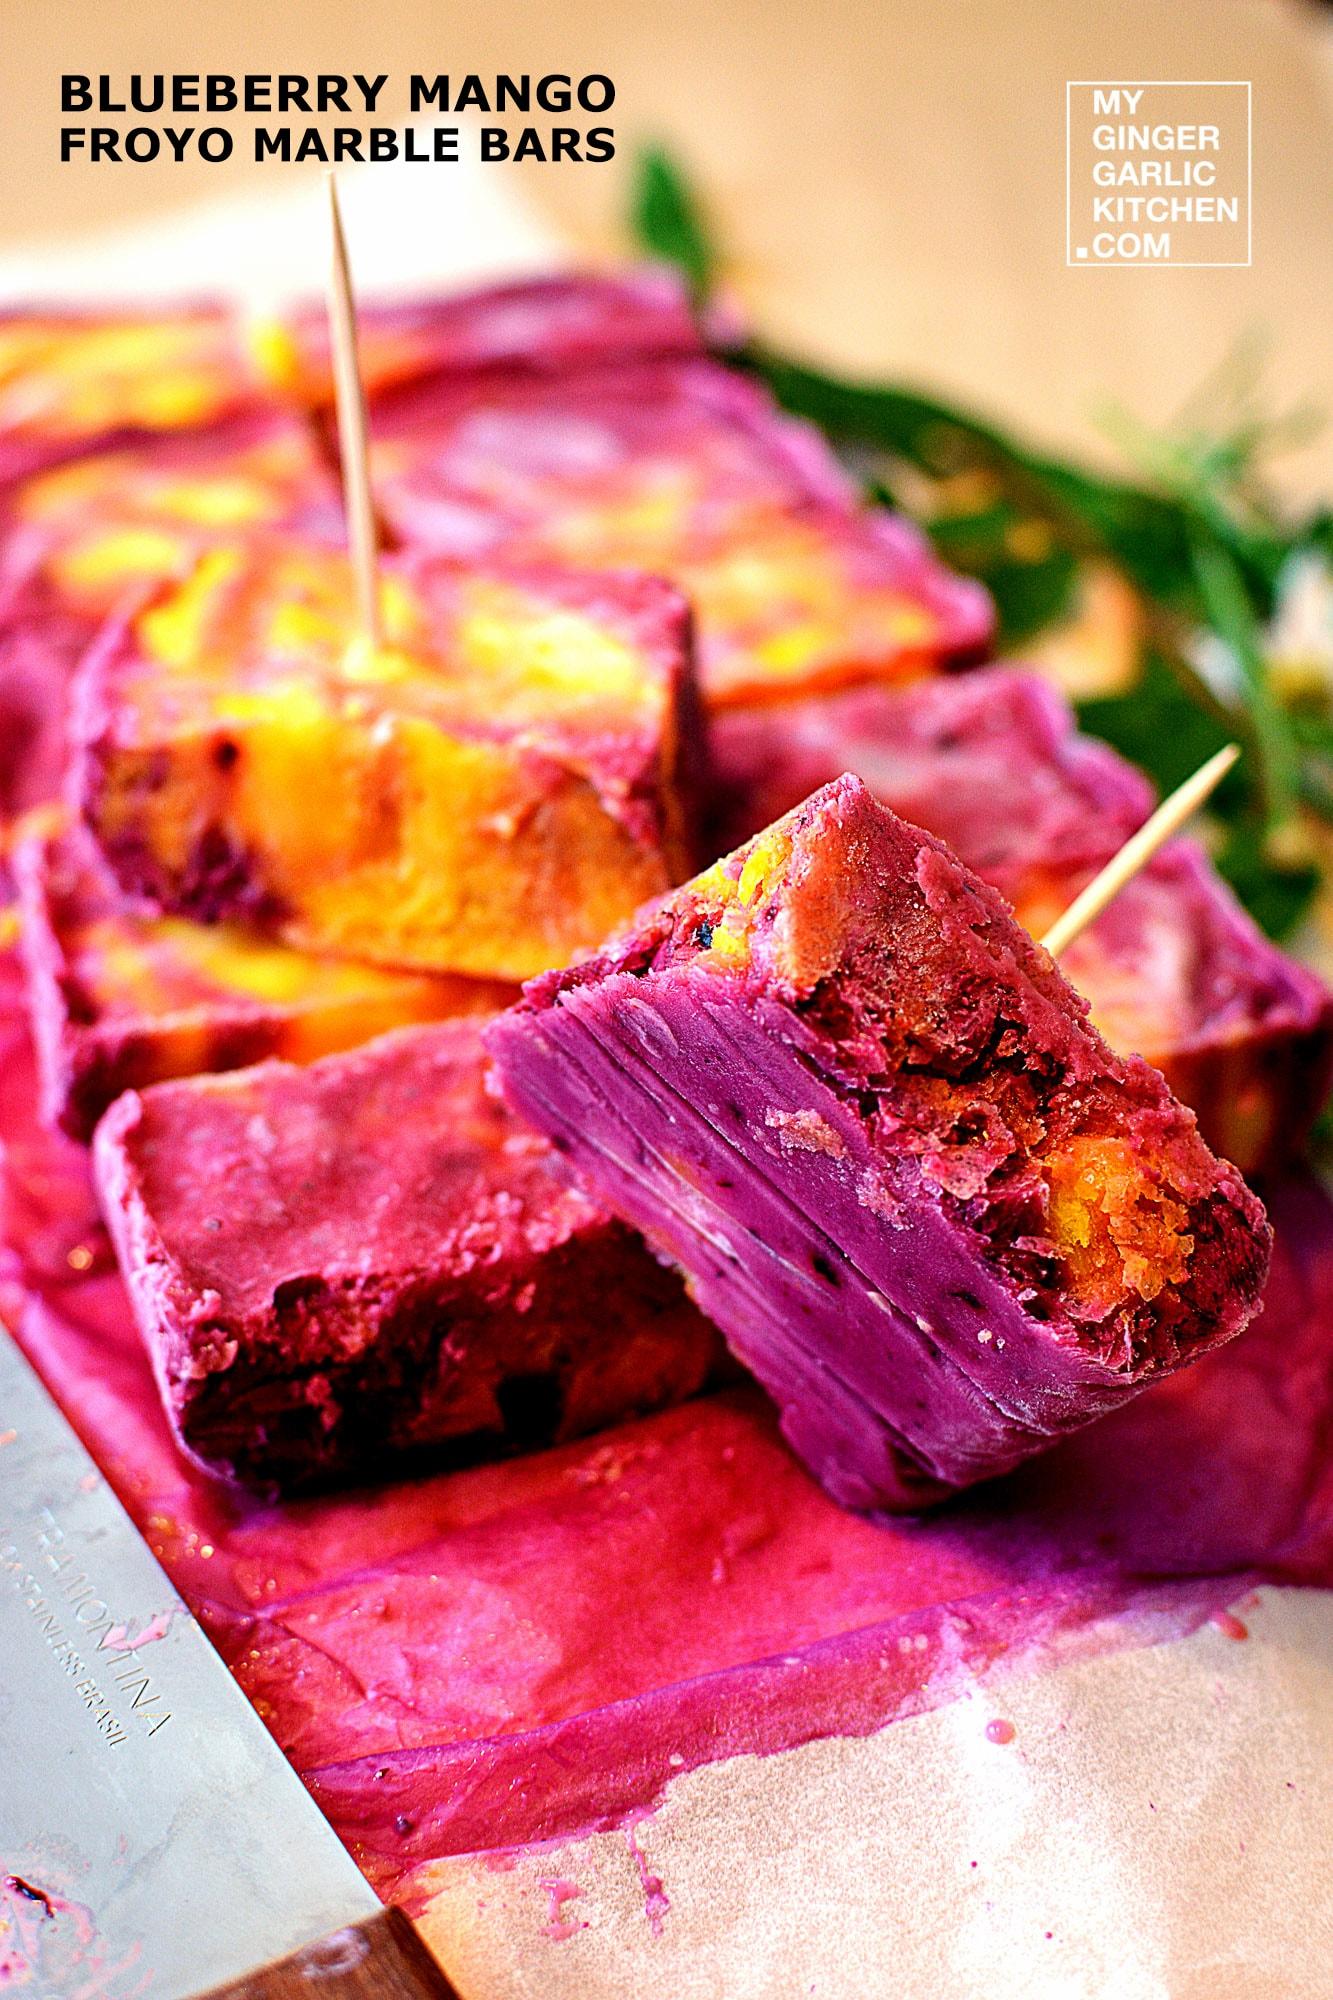 recipe-blueberry-mango-froyo-marble-bars-anupama-paliwal-my-ginger-garlic-kitchen-5